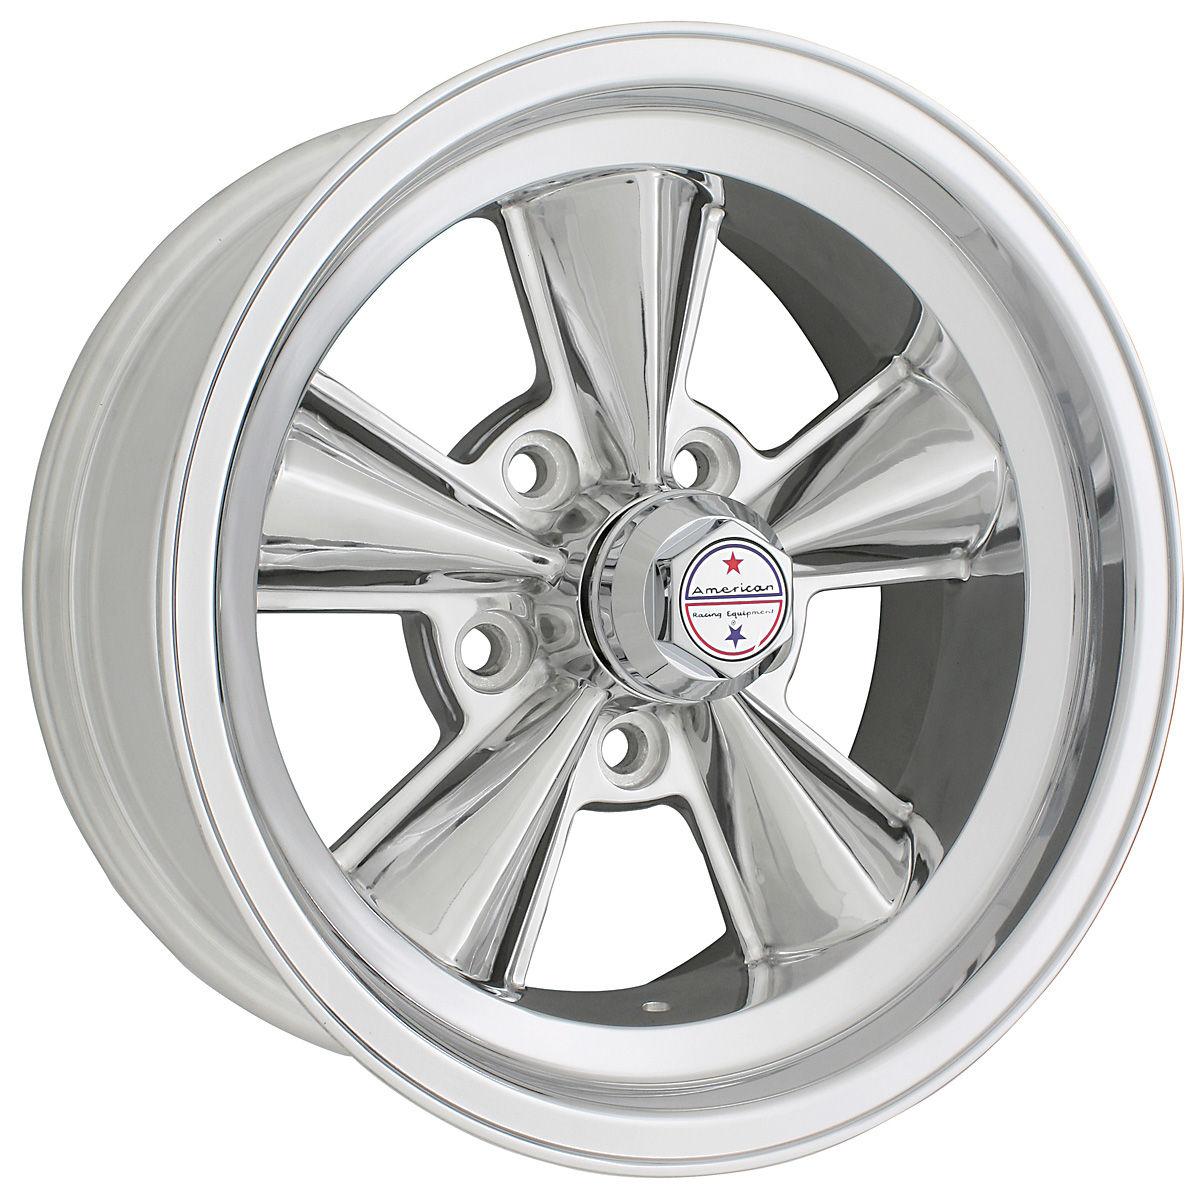 "Wheel, American Racing, T70R, 15"" X 7"", Polished"